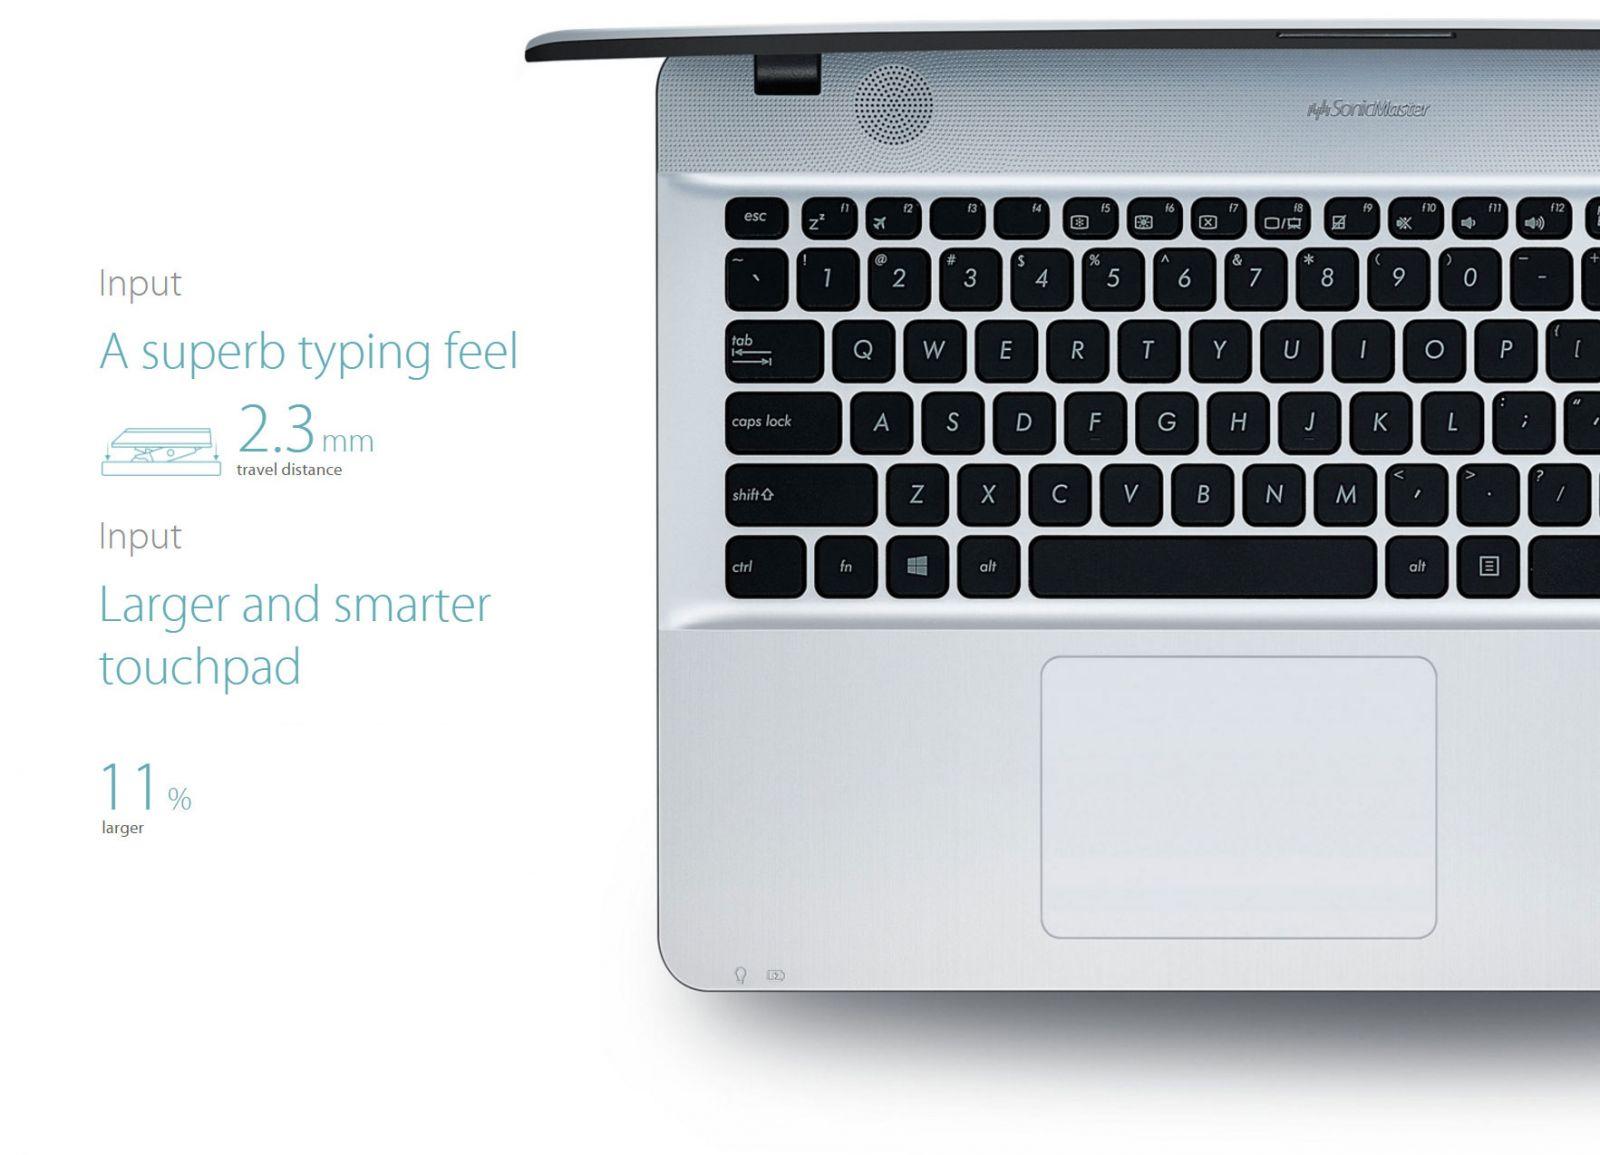 Promo Harga Lenovo Ideapad 110 14 N3160 Ram 2gb Quadcore 305 80r1005wid Notebook Silver Inch I3 500gb Sshd 8gb Amd R5 Win 10 Asus Vivobook Max X441sa Bx001t Win10 Rasakan Pengalaman